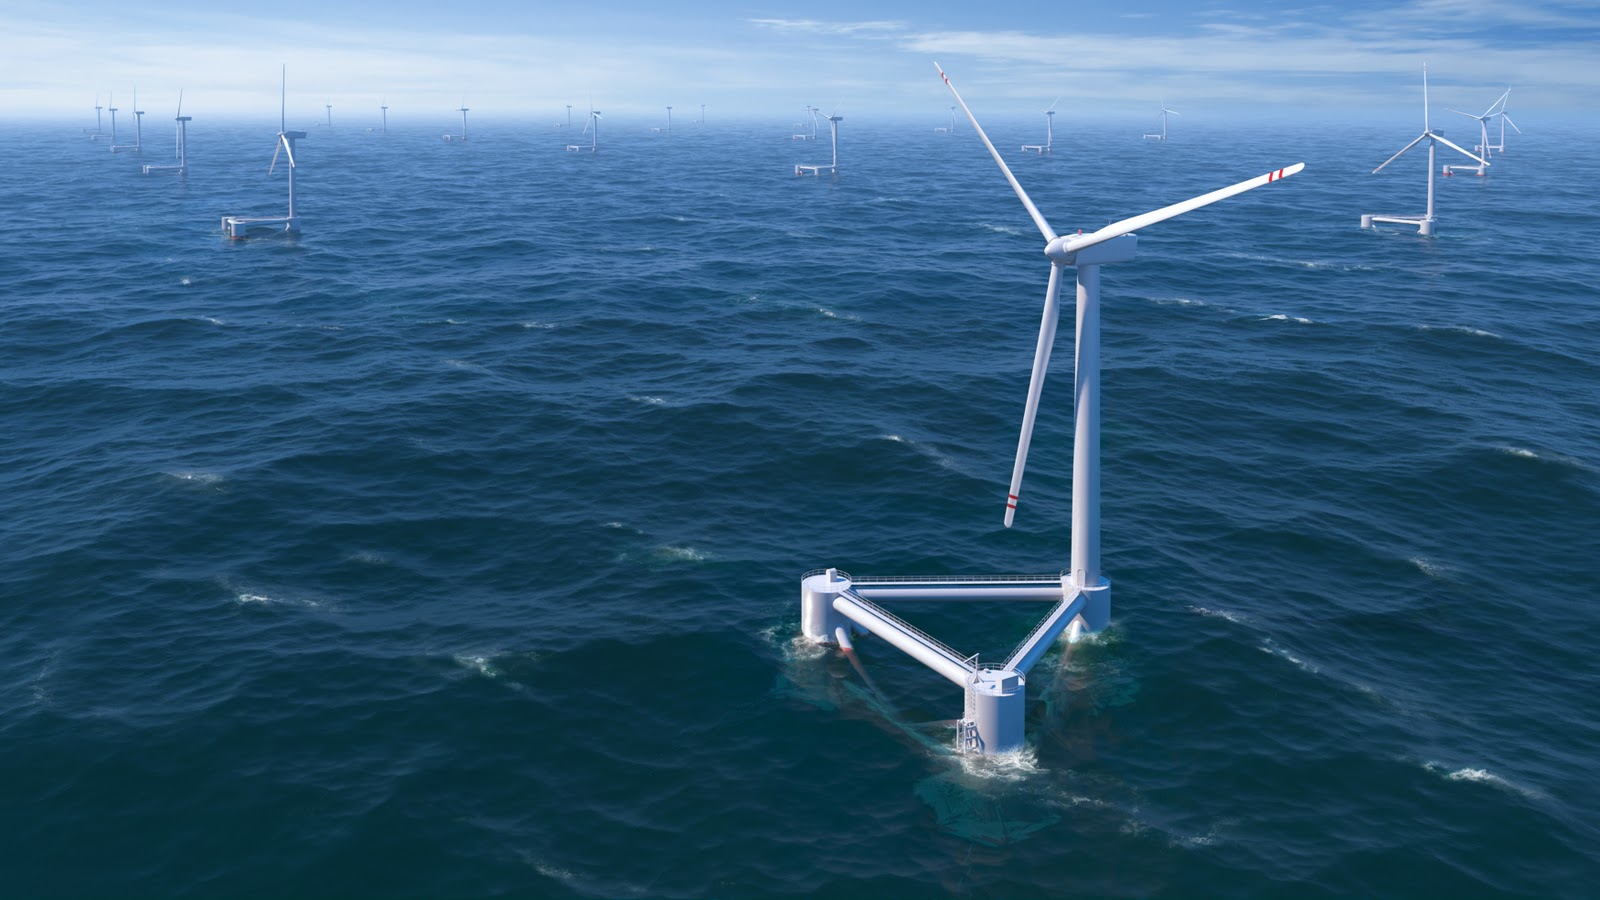 energia eolica casera - photo #34